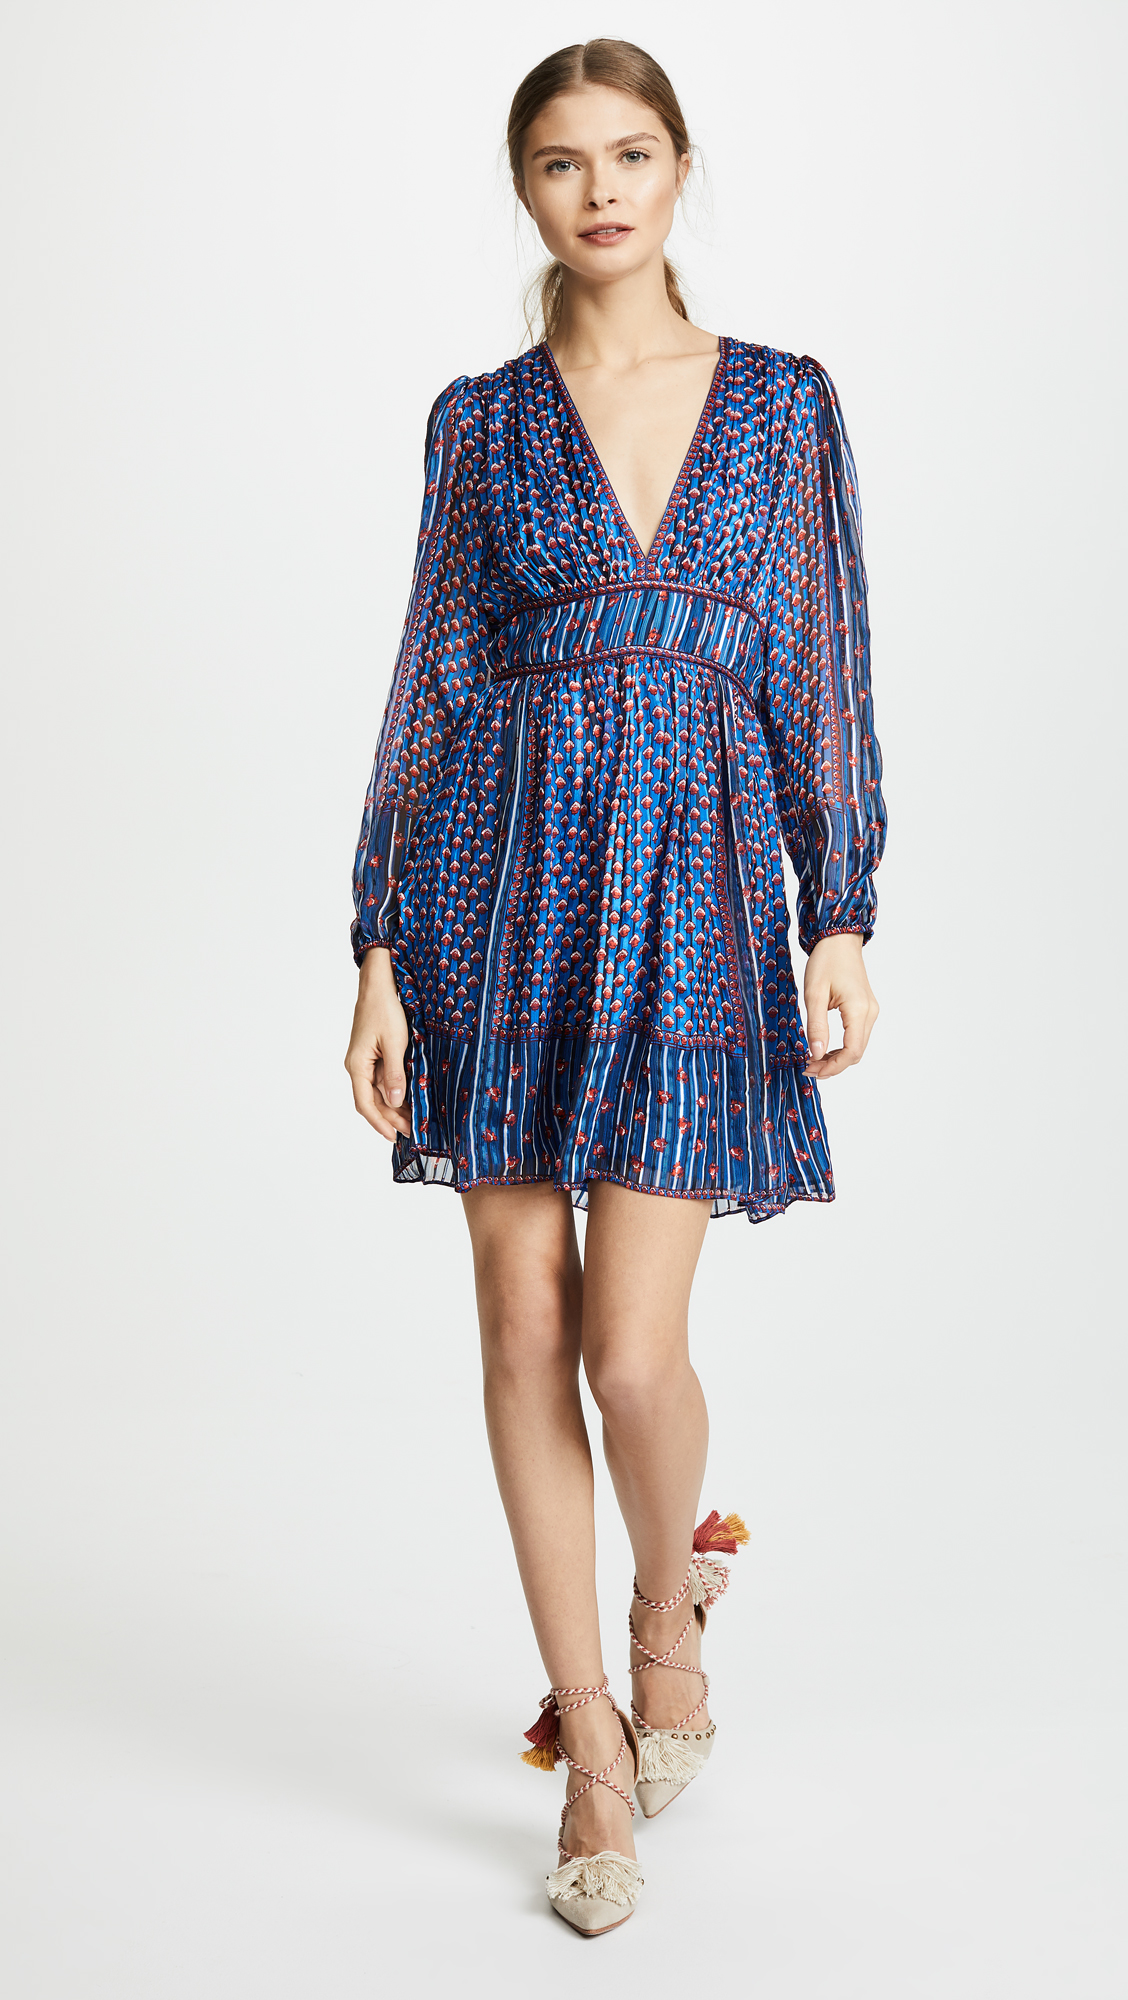 Ulla johnson shopbop ulla johnson martine dress ombrellifo Image collections